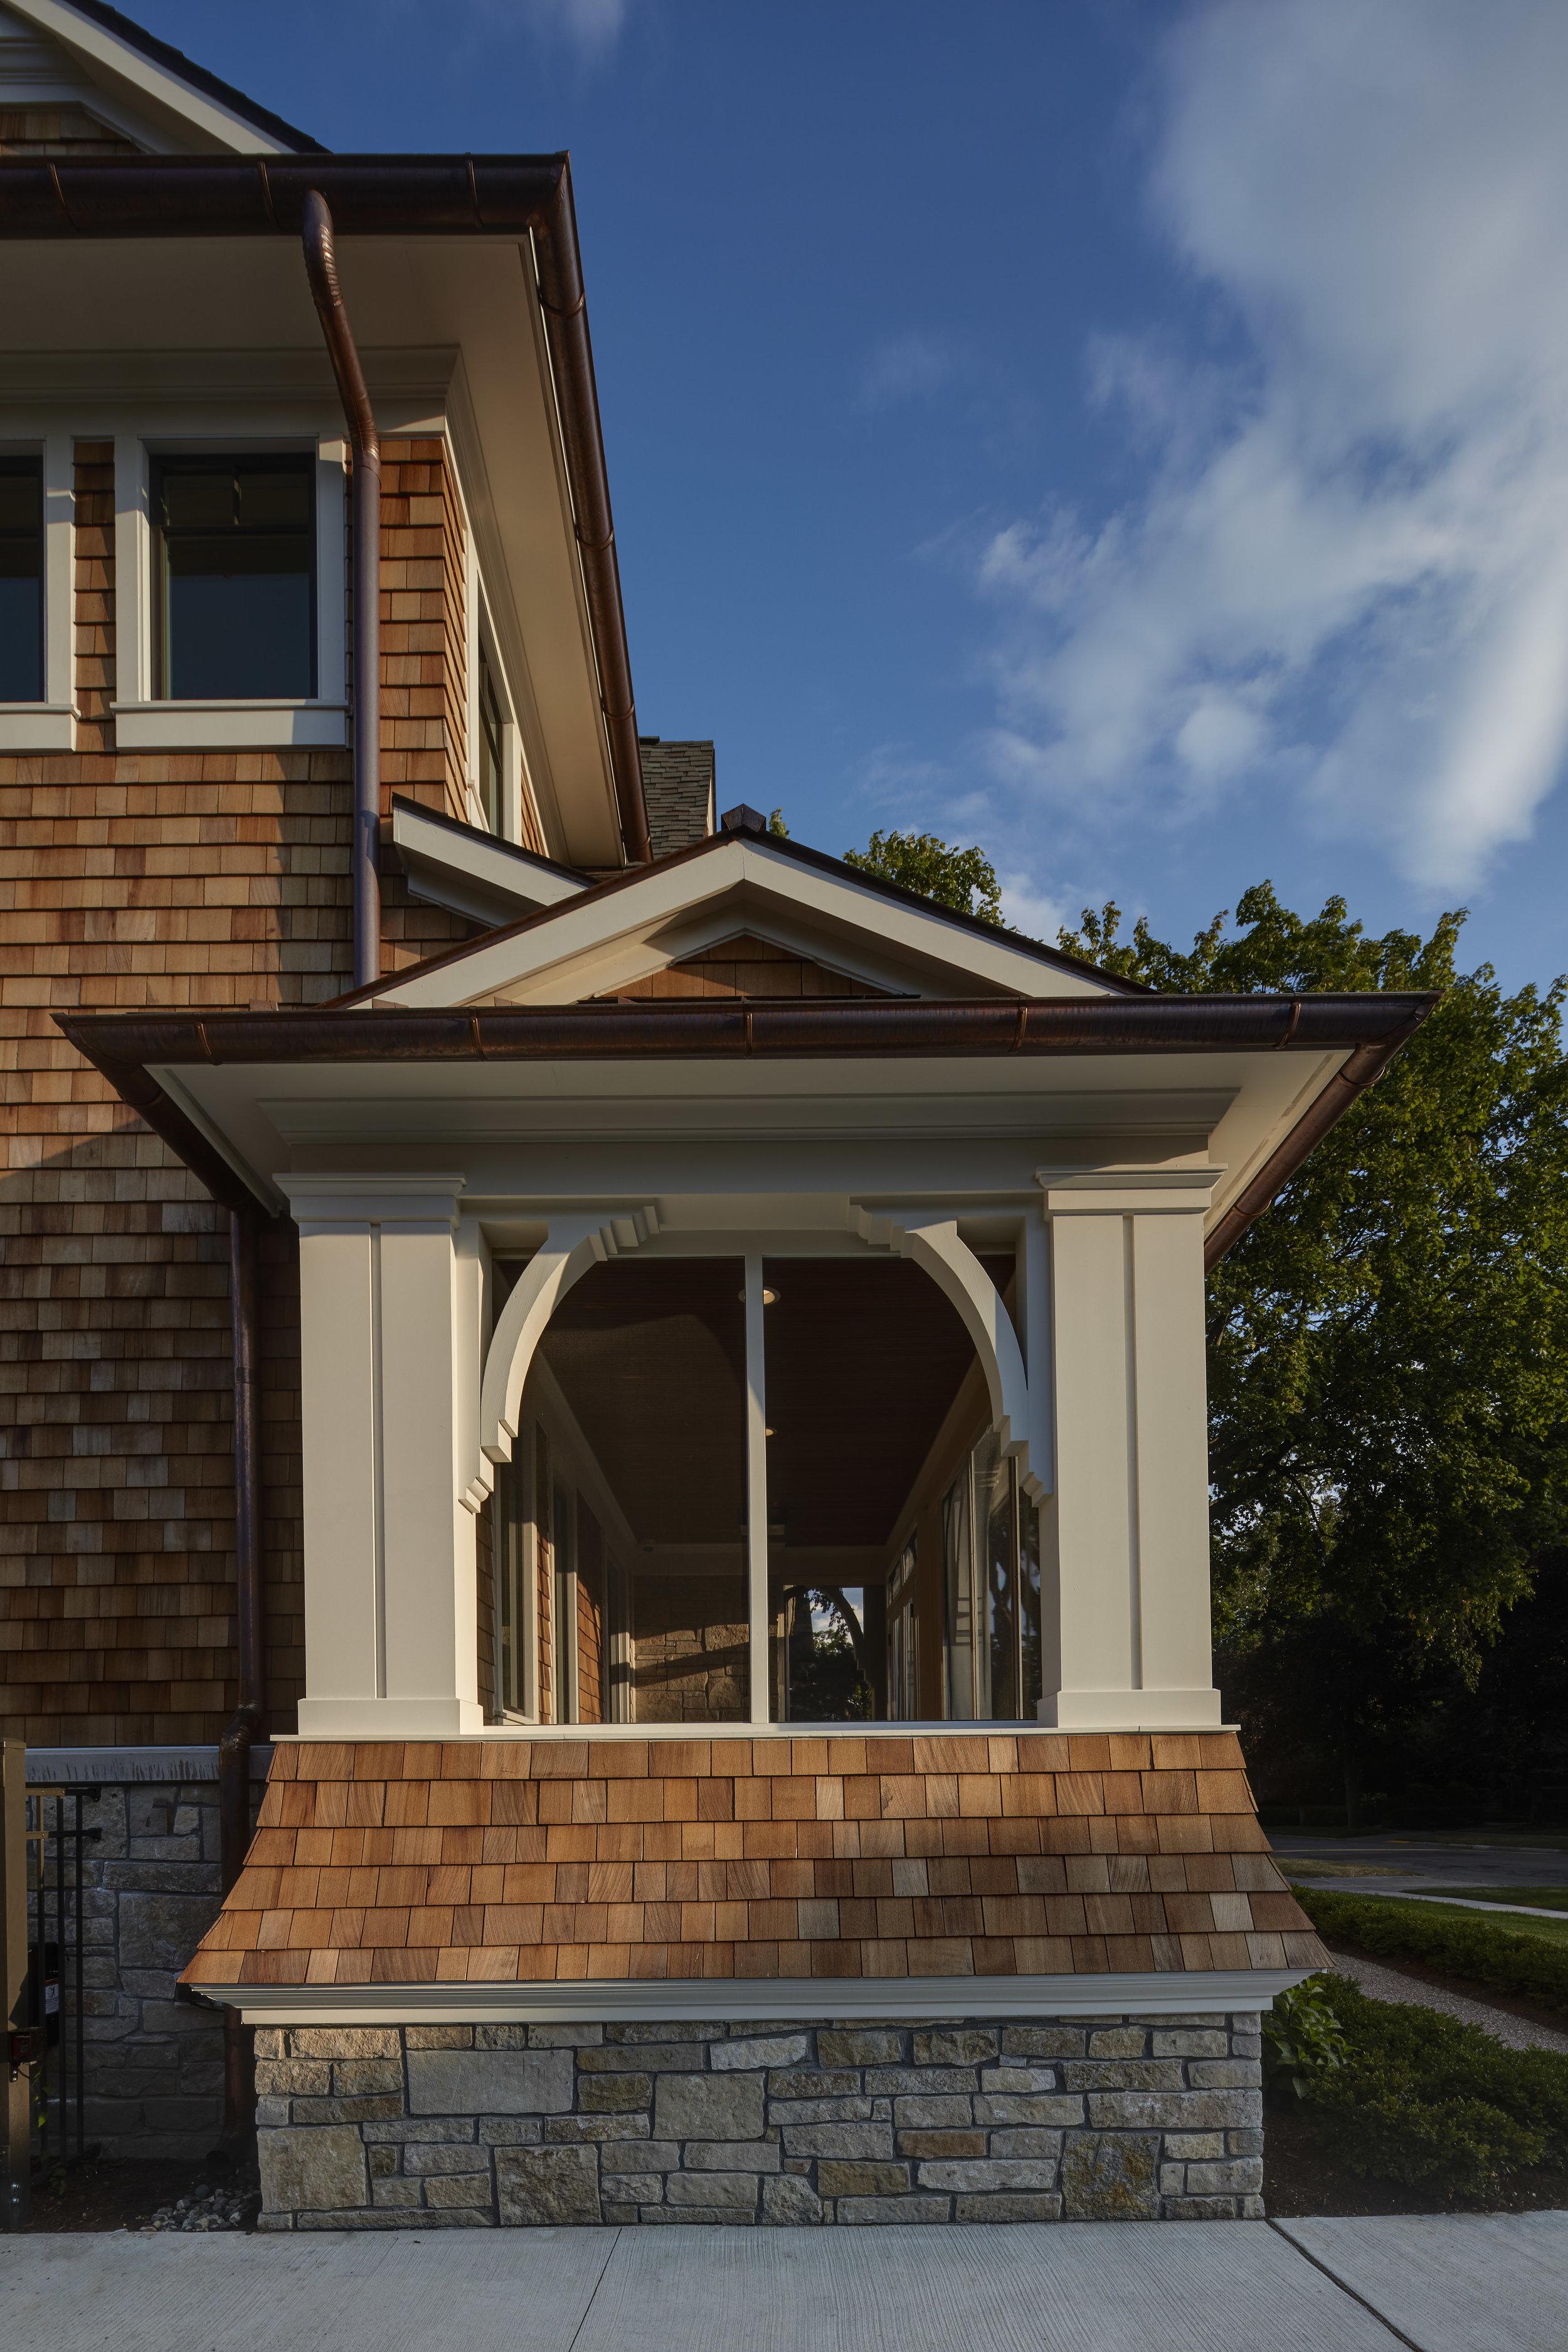 7-19-18-HM-Homes-629 Pierce-exteriors-0699_700_701_702_703_704_705_Fusion-Natural.jpg